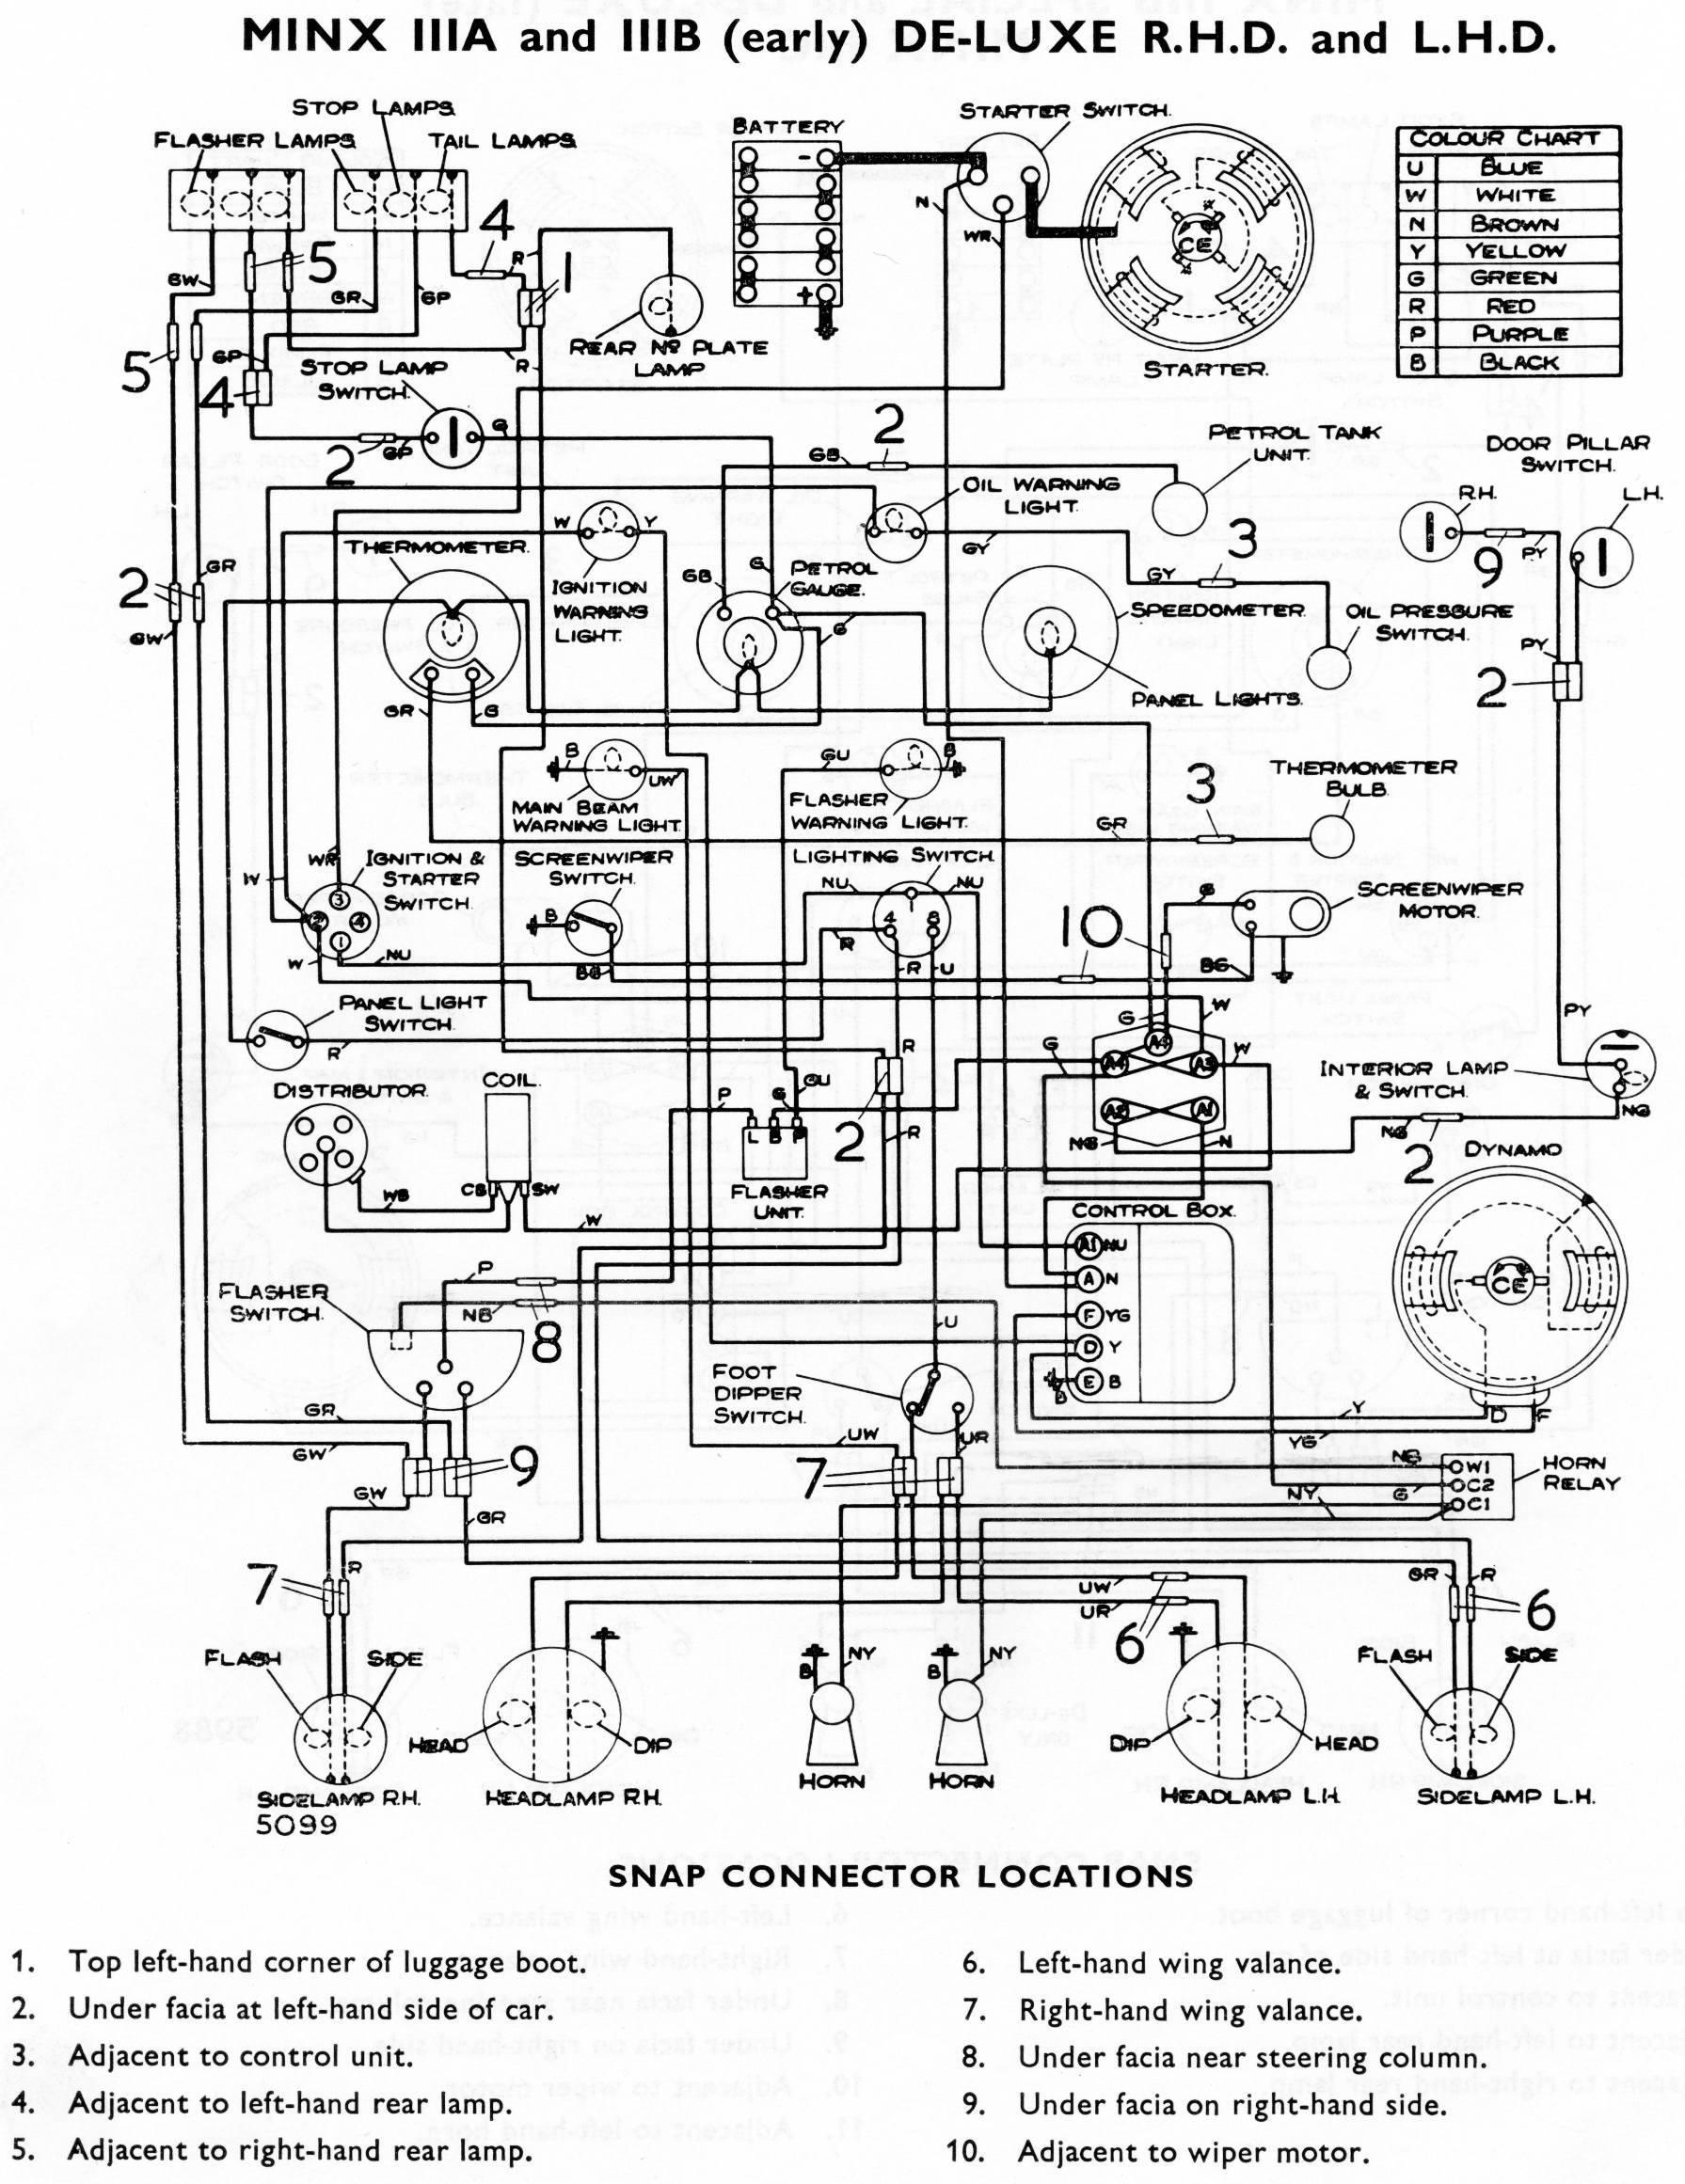 Nissan Skyline R33 Wiring Diagram - Wiring Diagram